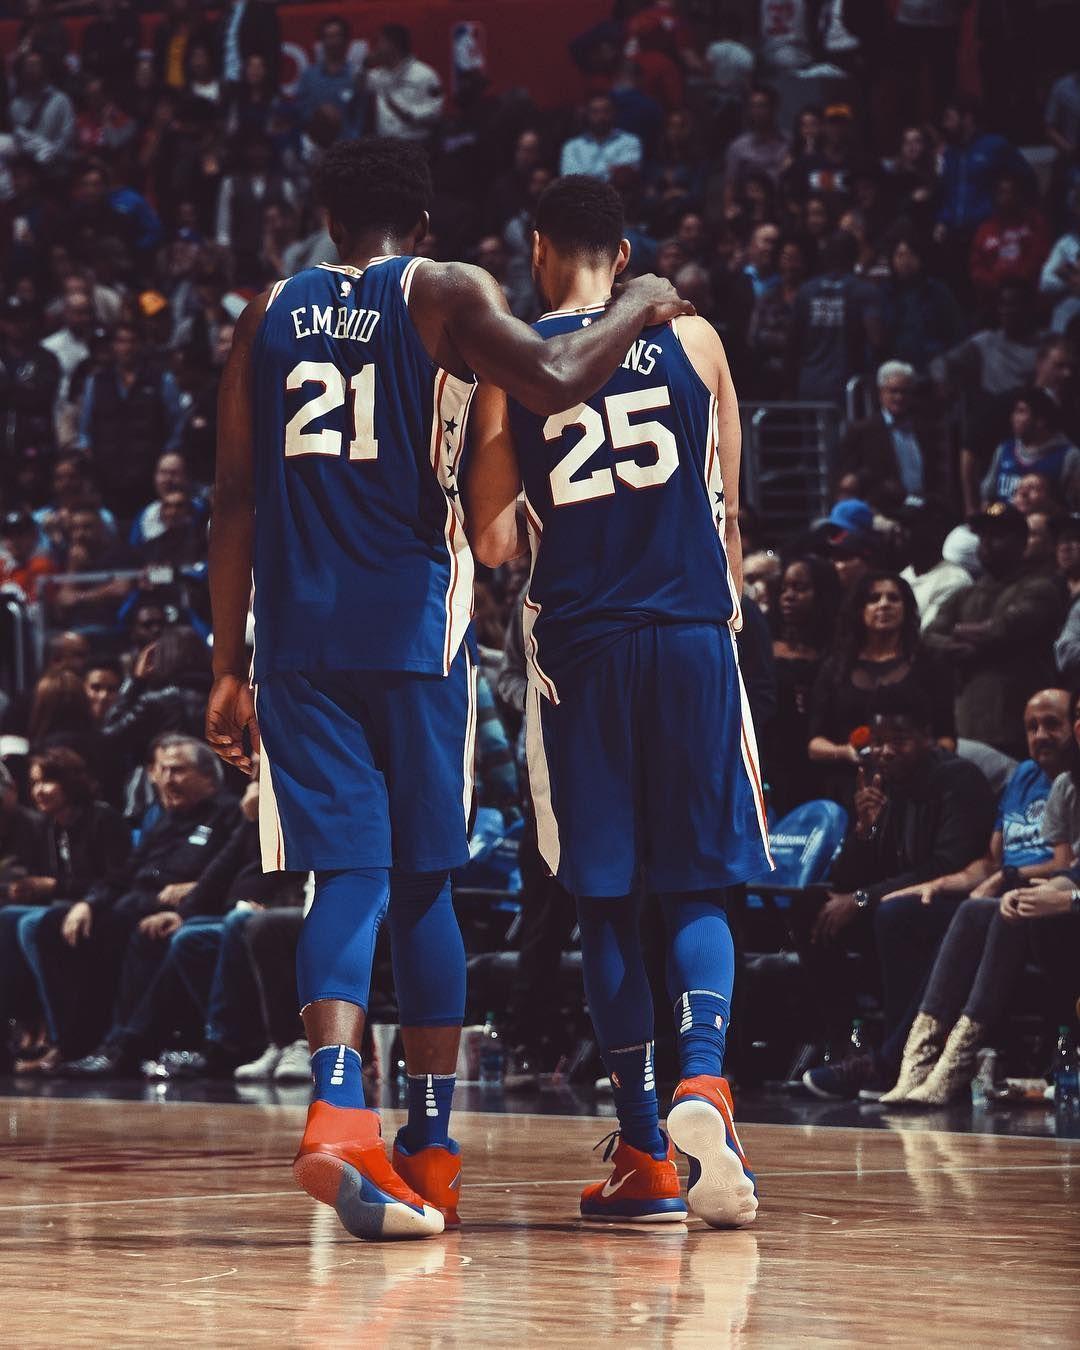 Instagram | Basketball jones, Nba players, Ben simmons 76ers